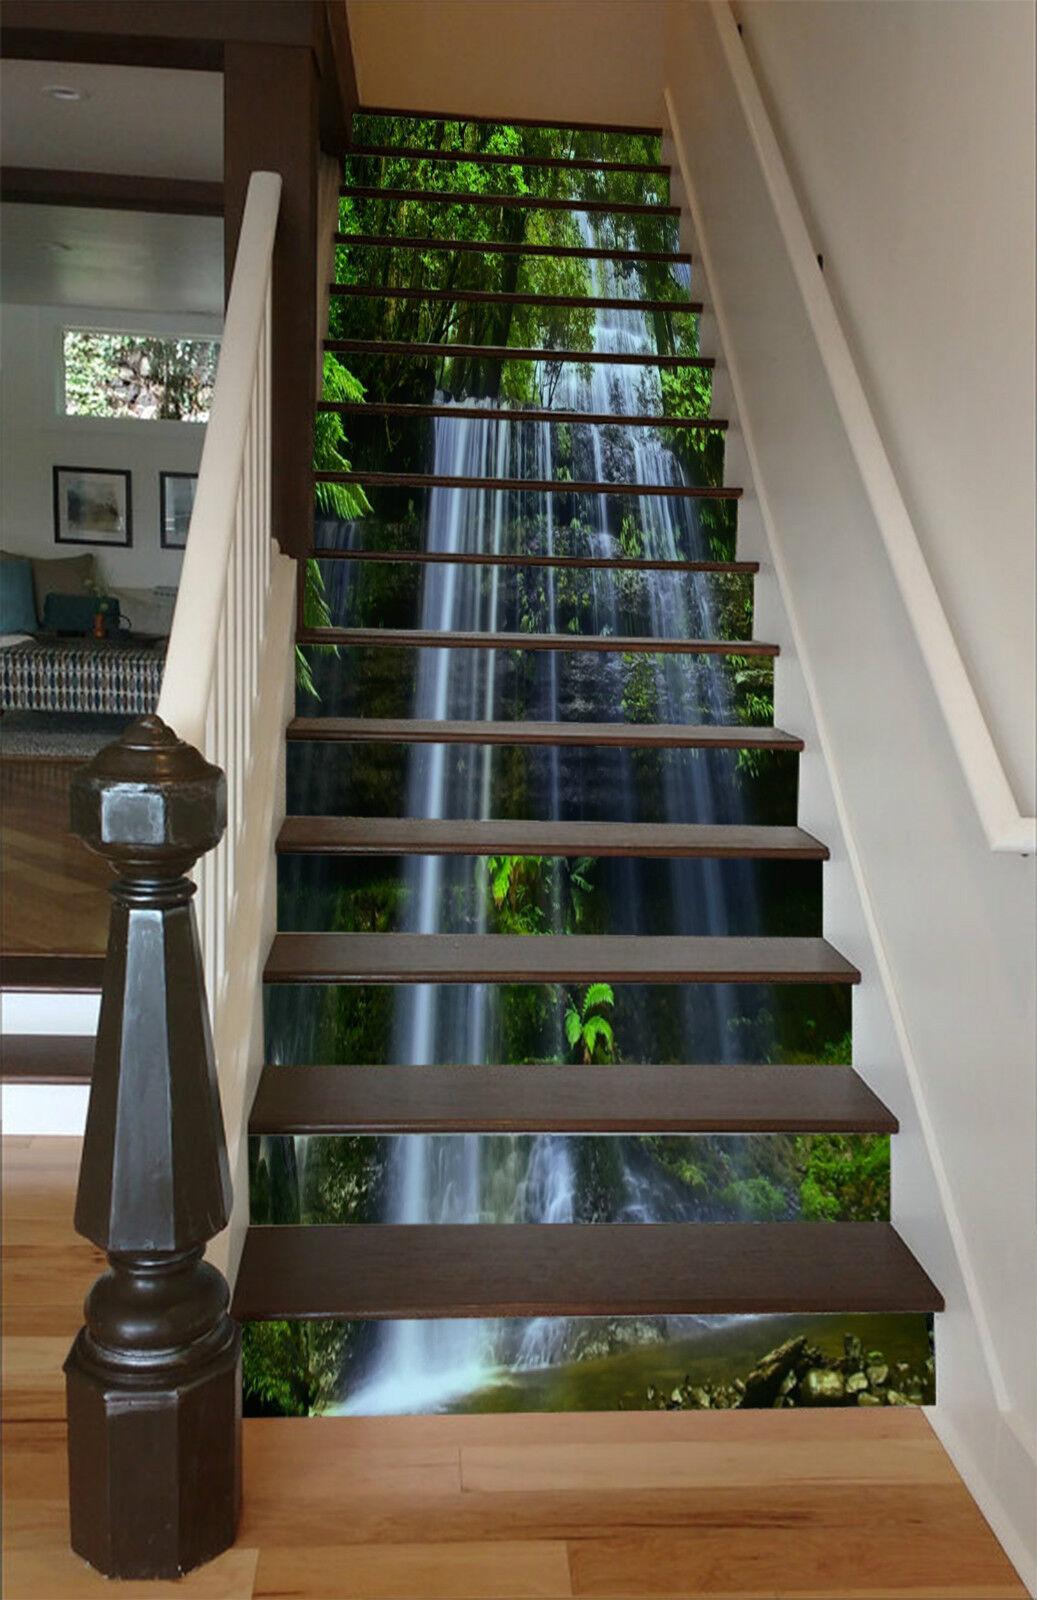 3D Wasser Vorhang 2 Stair Risers Dekoration Fototapete Vinyl Aufkleber Tapete DE